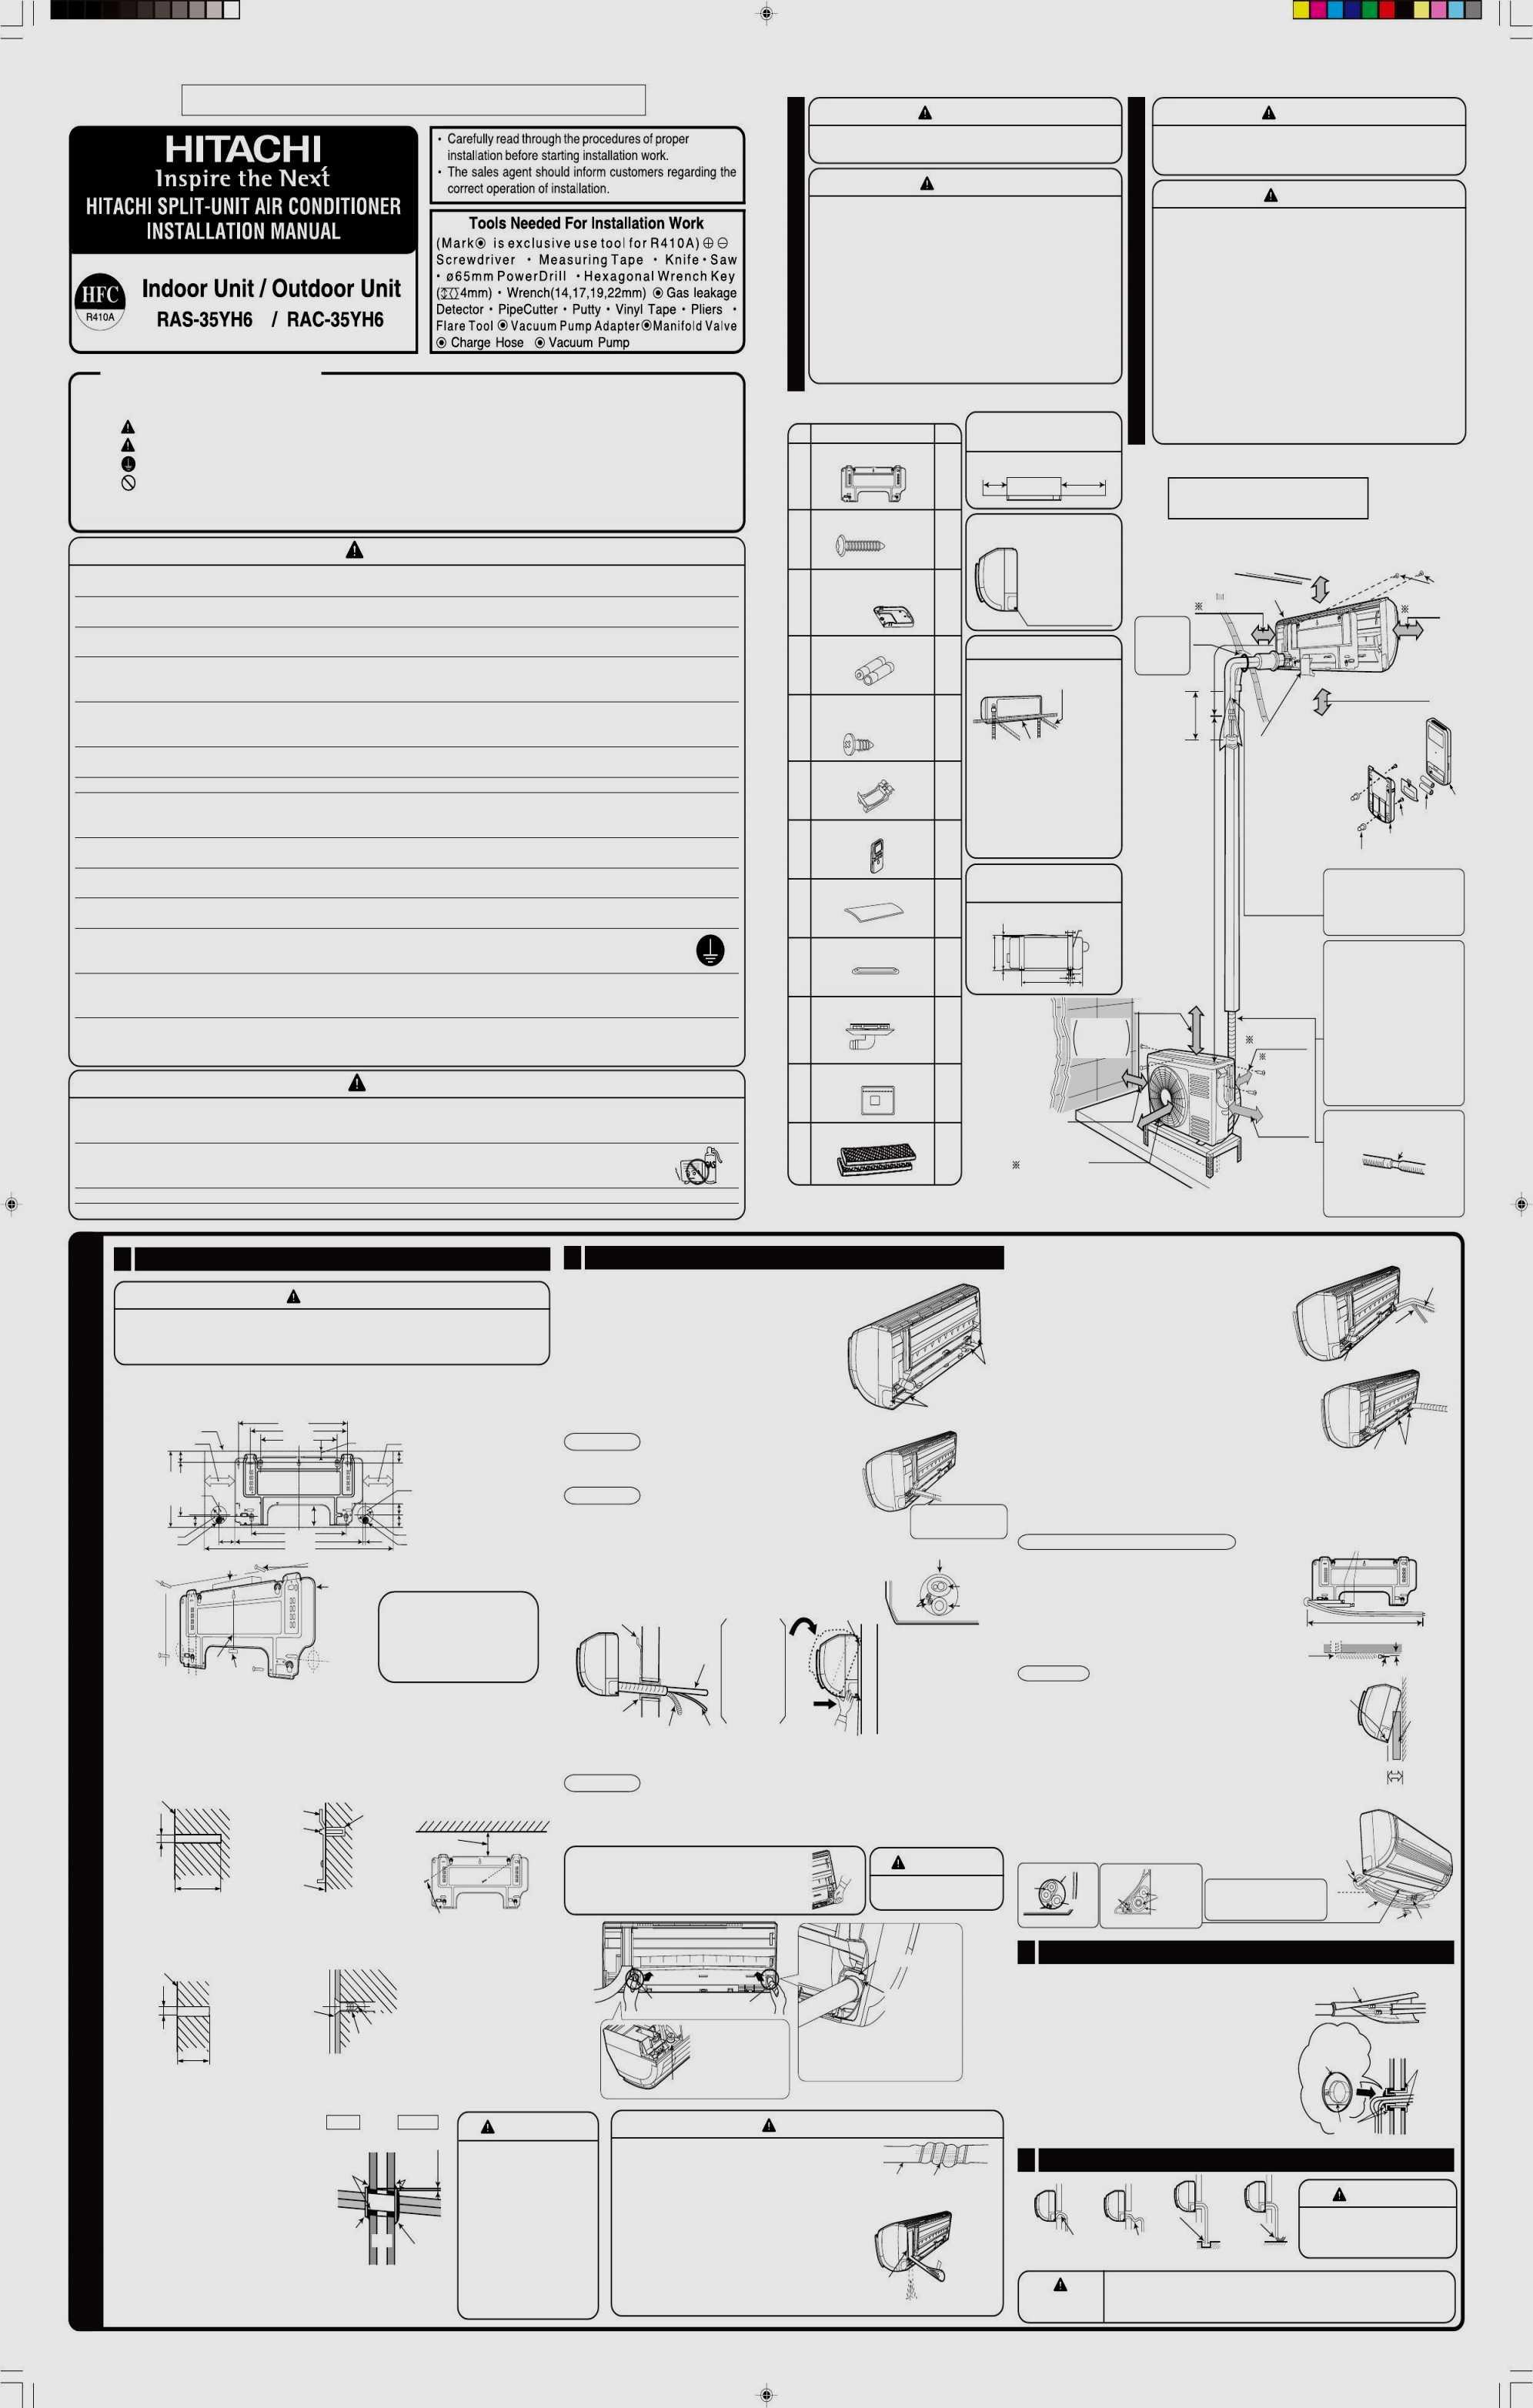 hight resolution of kicker cvr 12 wiring diagram likewise wiring sub pro39s and the like kicker cvr 12 wiring diagram